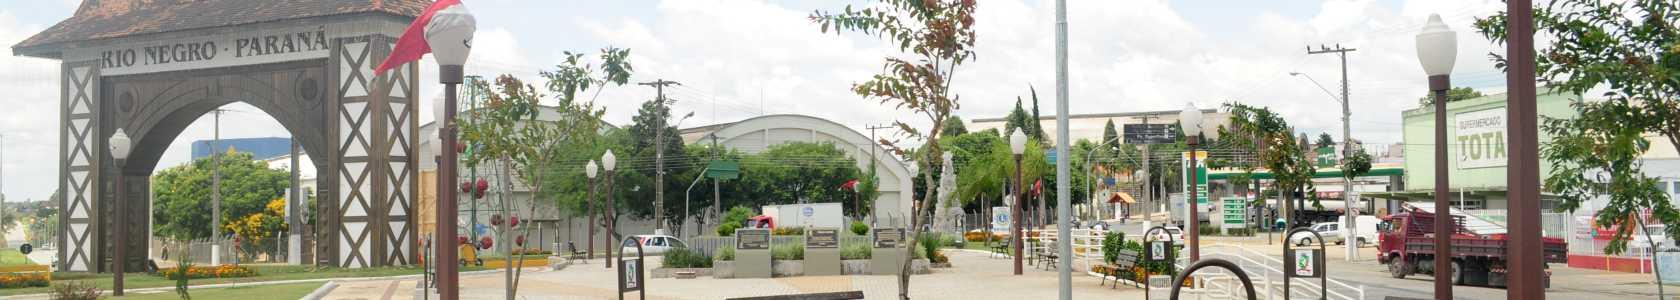 Conheça Rio Negro e Mafra (2)